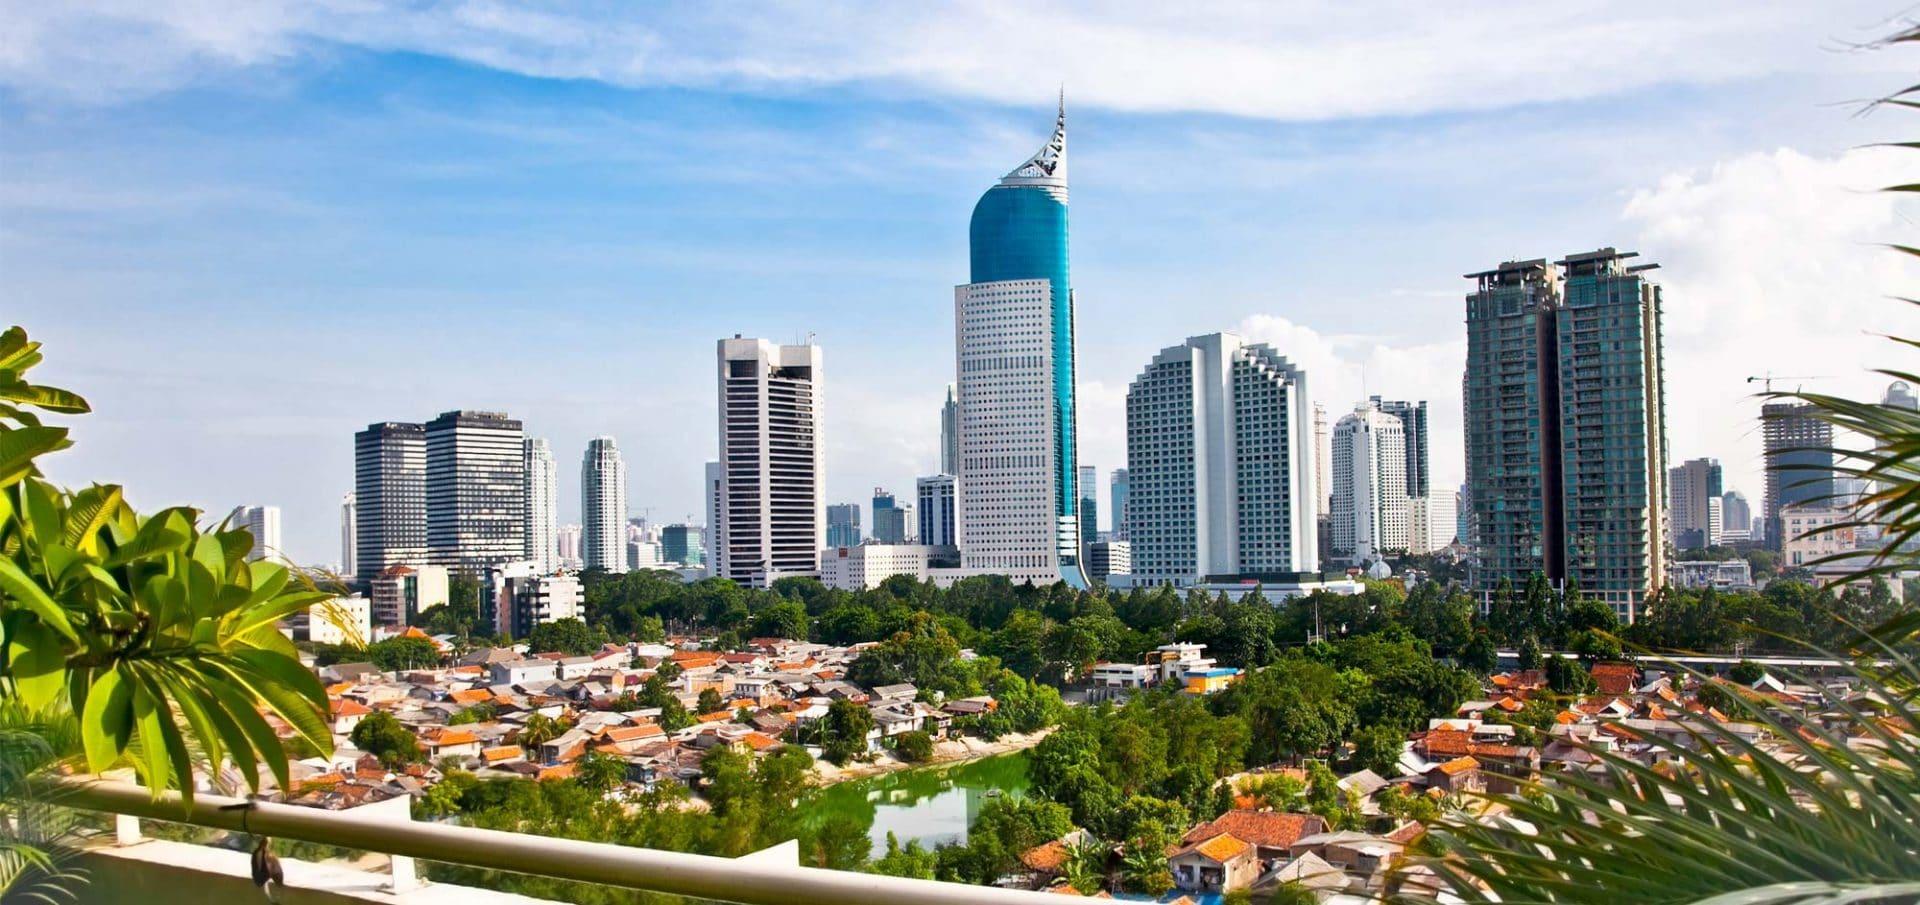 kliniek hasci Jakarta Indonesie